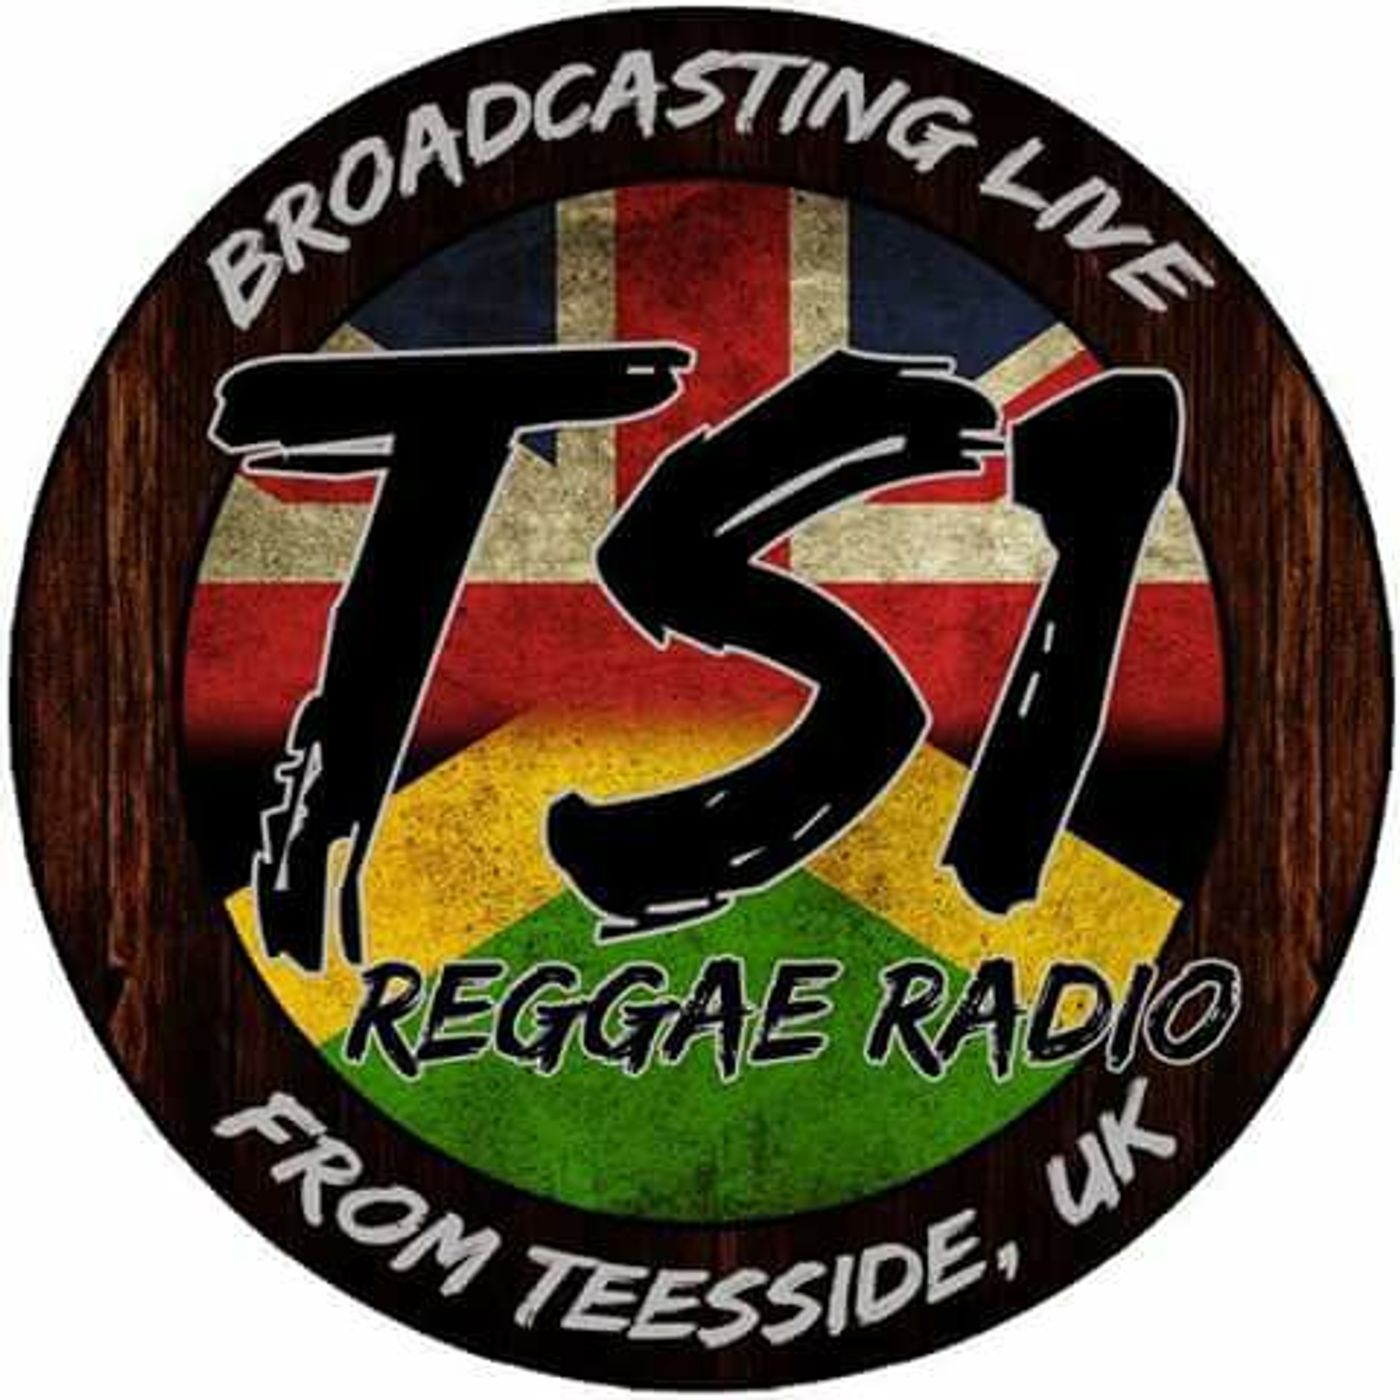 7pm UK . Ts1 Reggae Radio UK & Cushuk.com